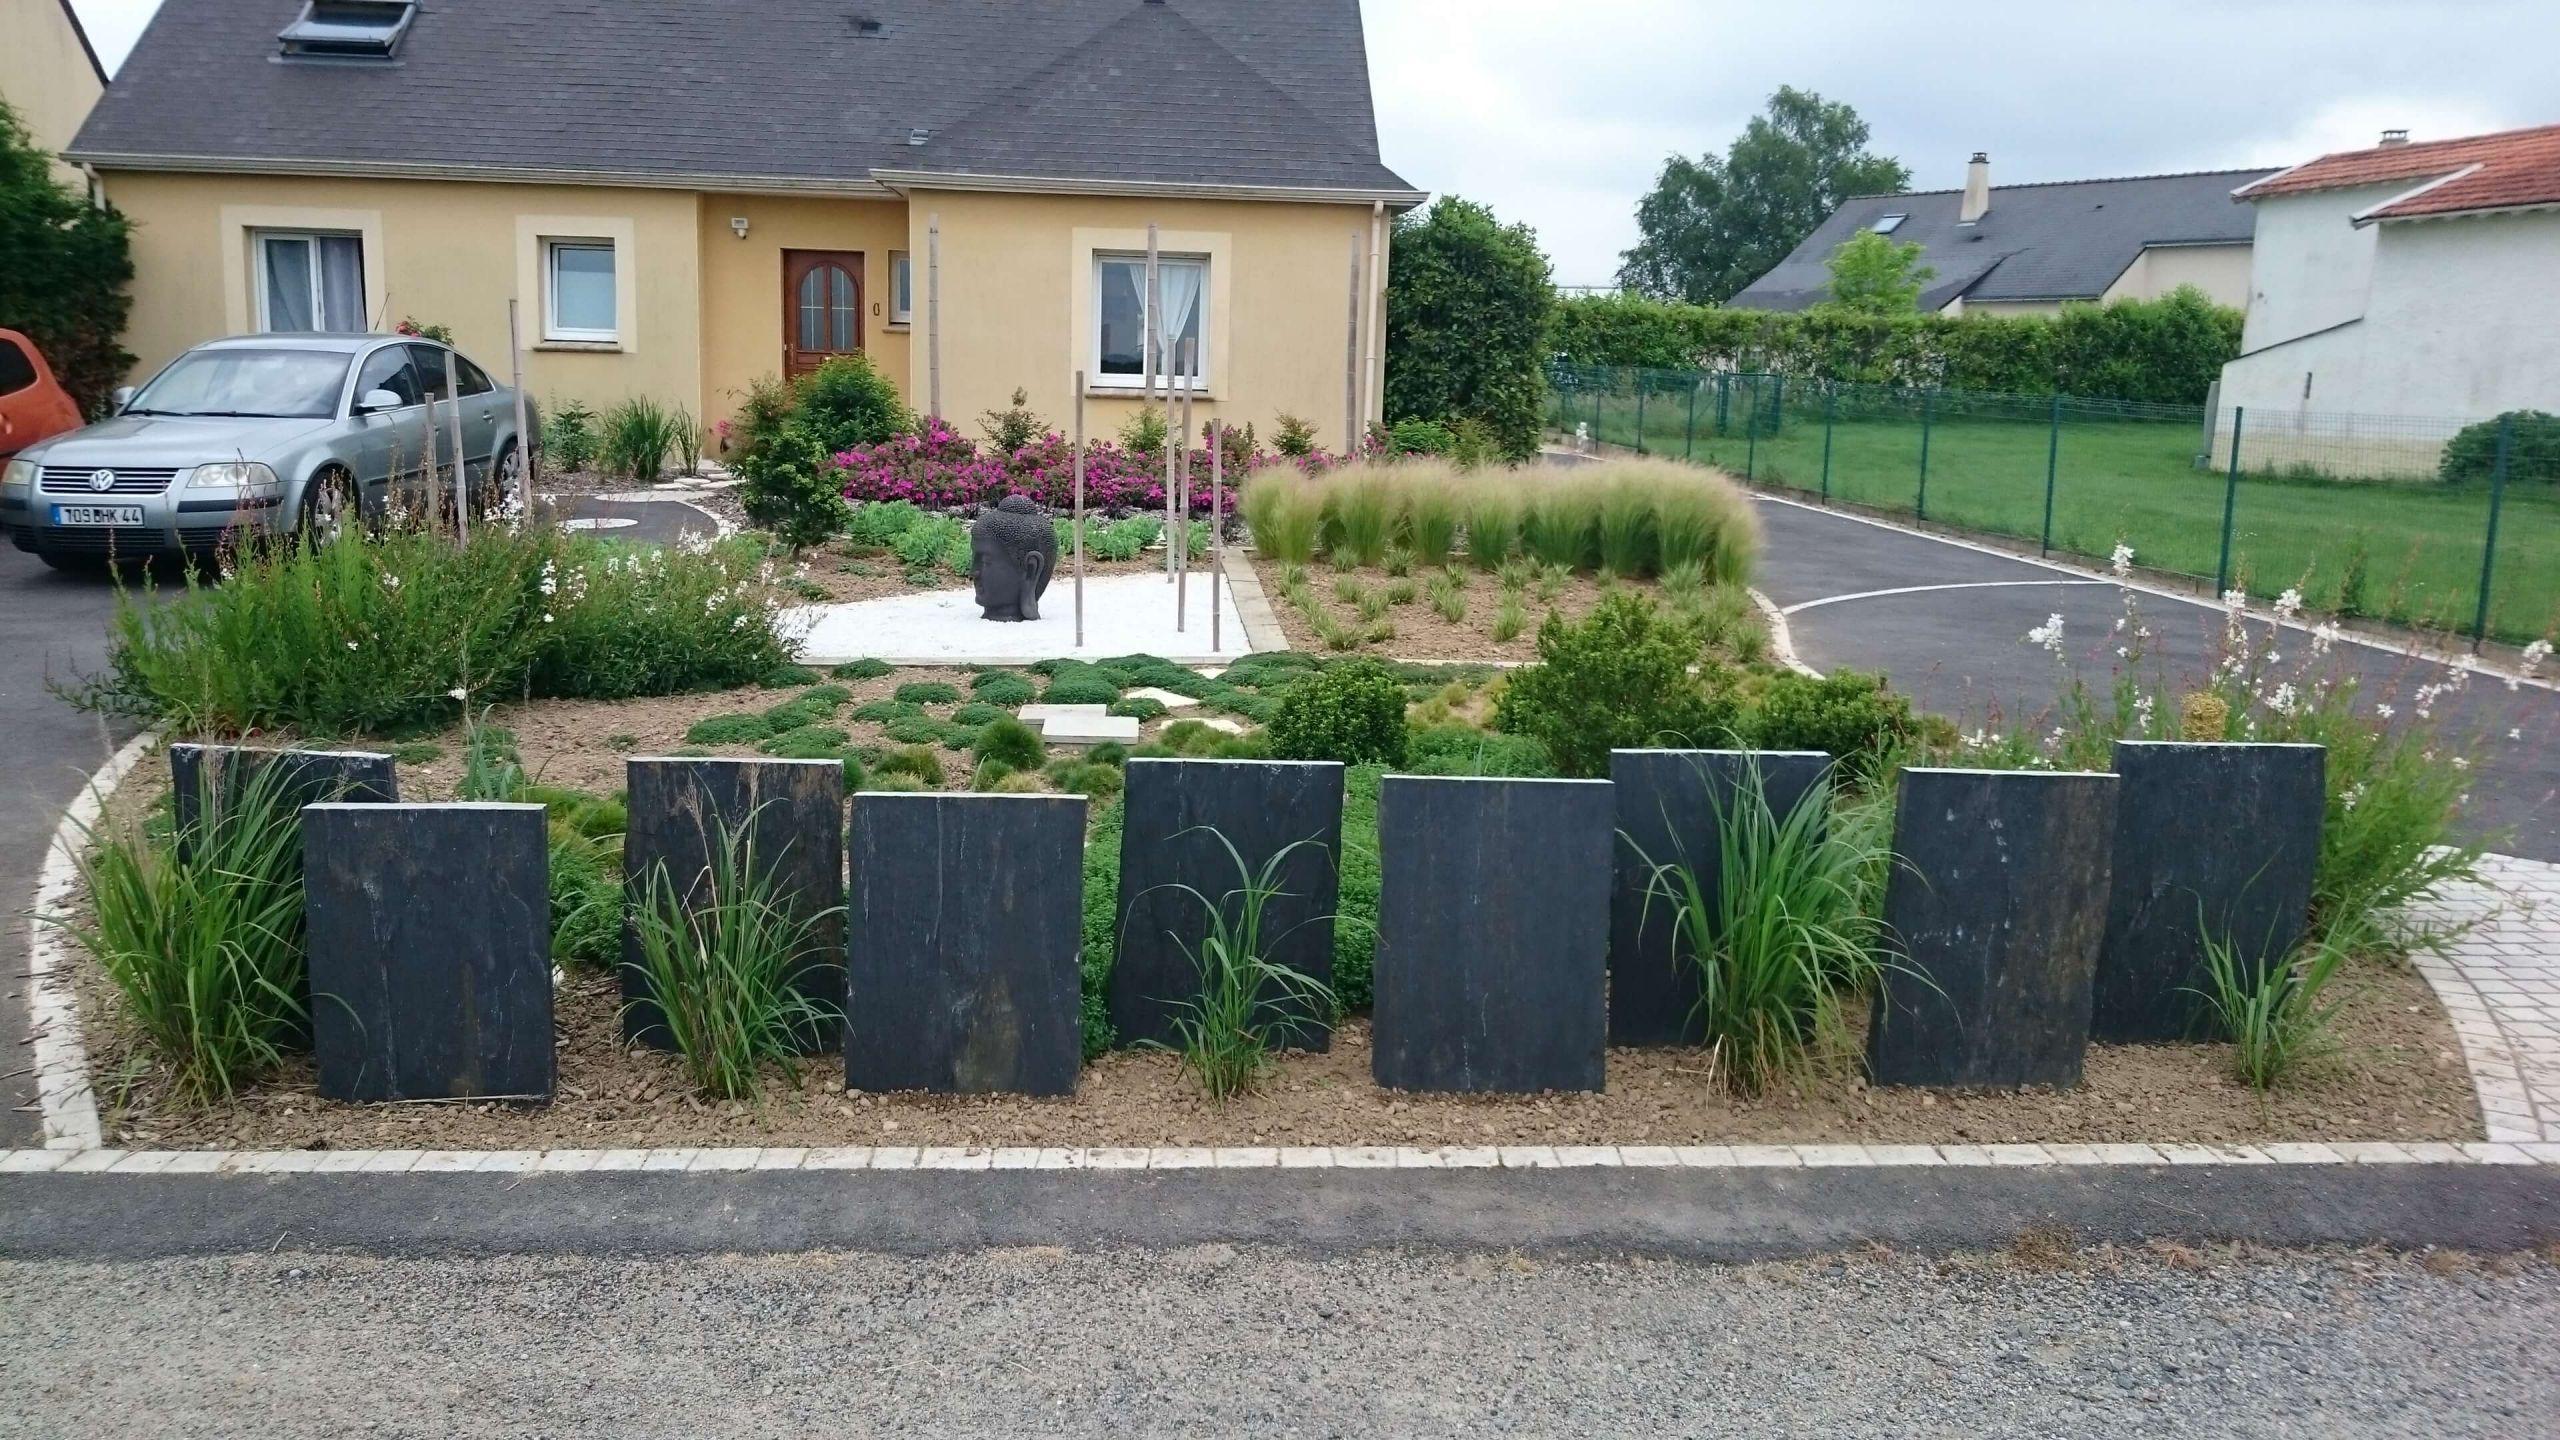 Massif Paysager Charmant astuces D Entretien Jardin Et Am Nagement Paysager